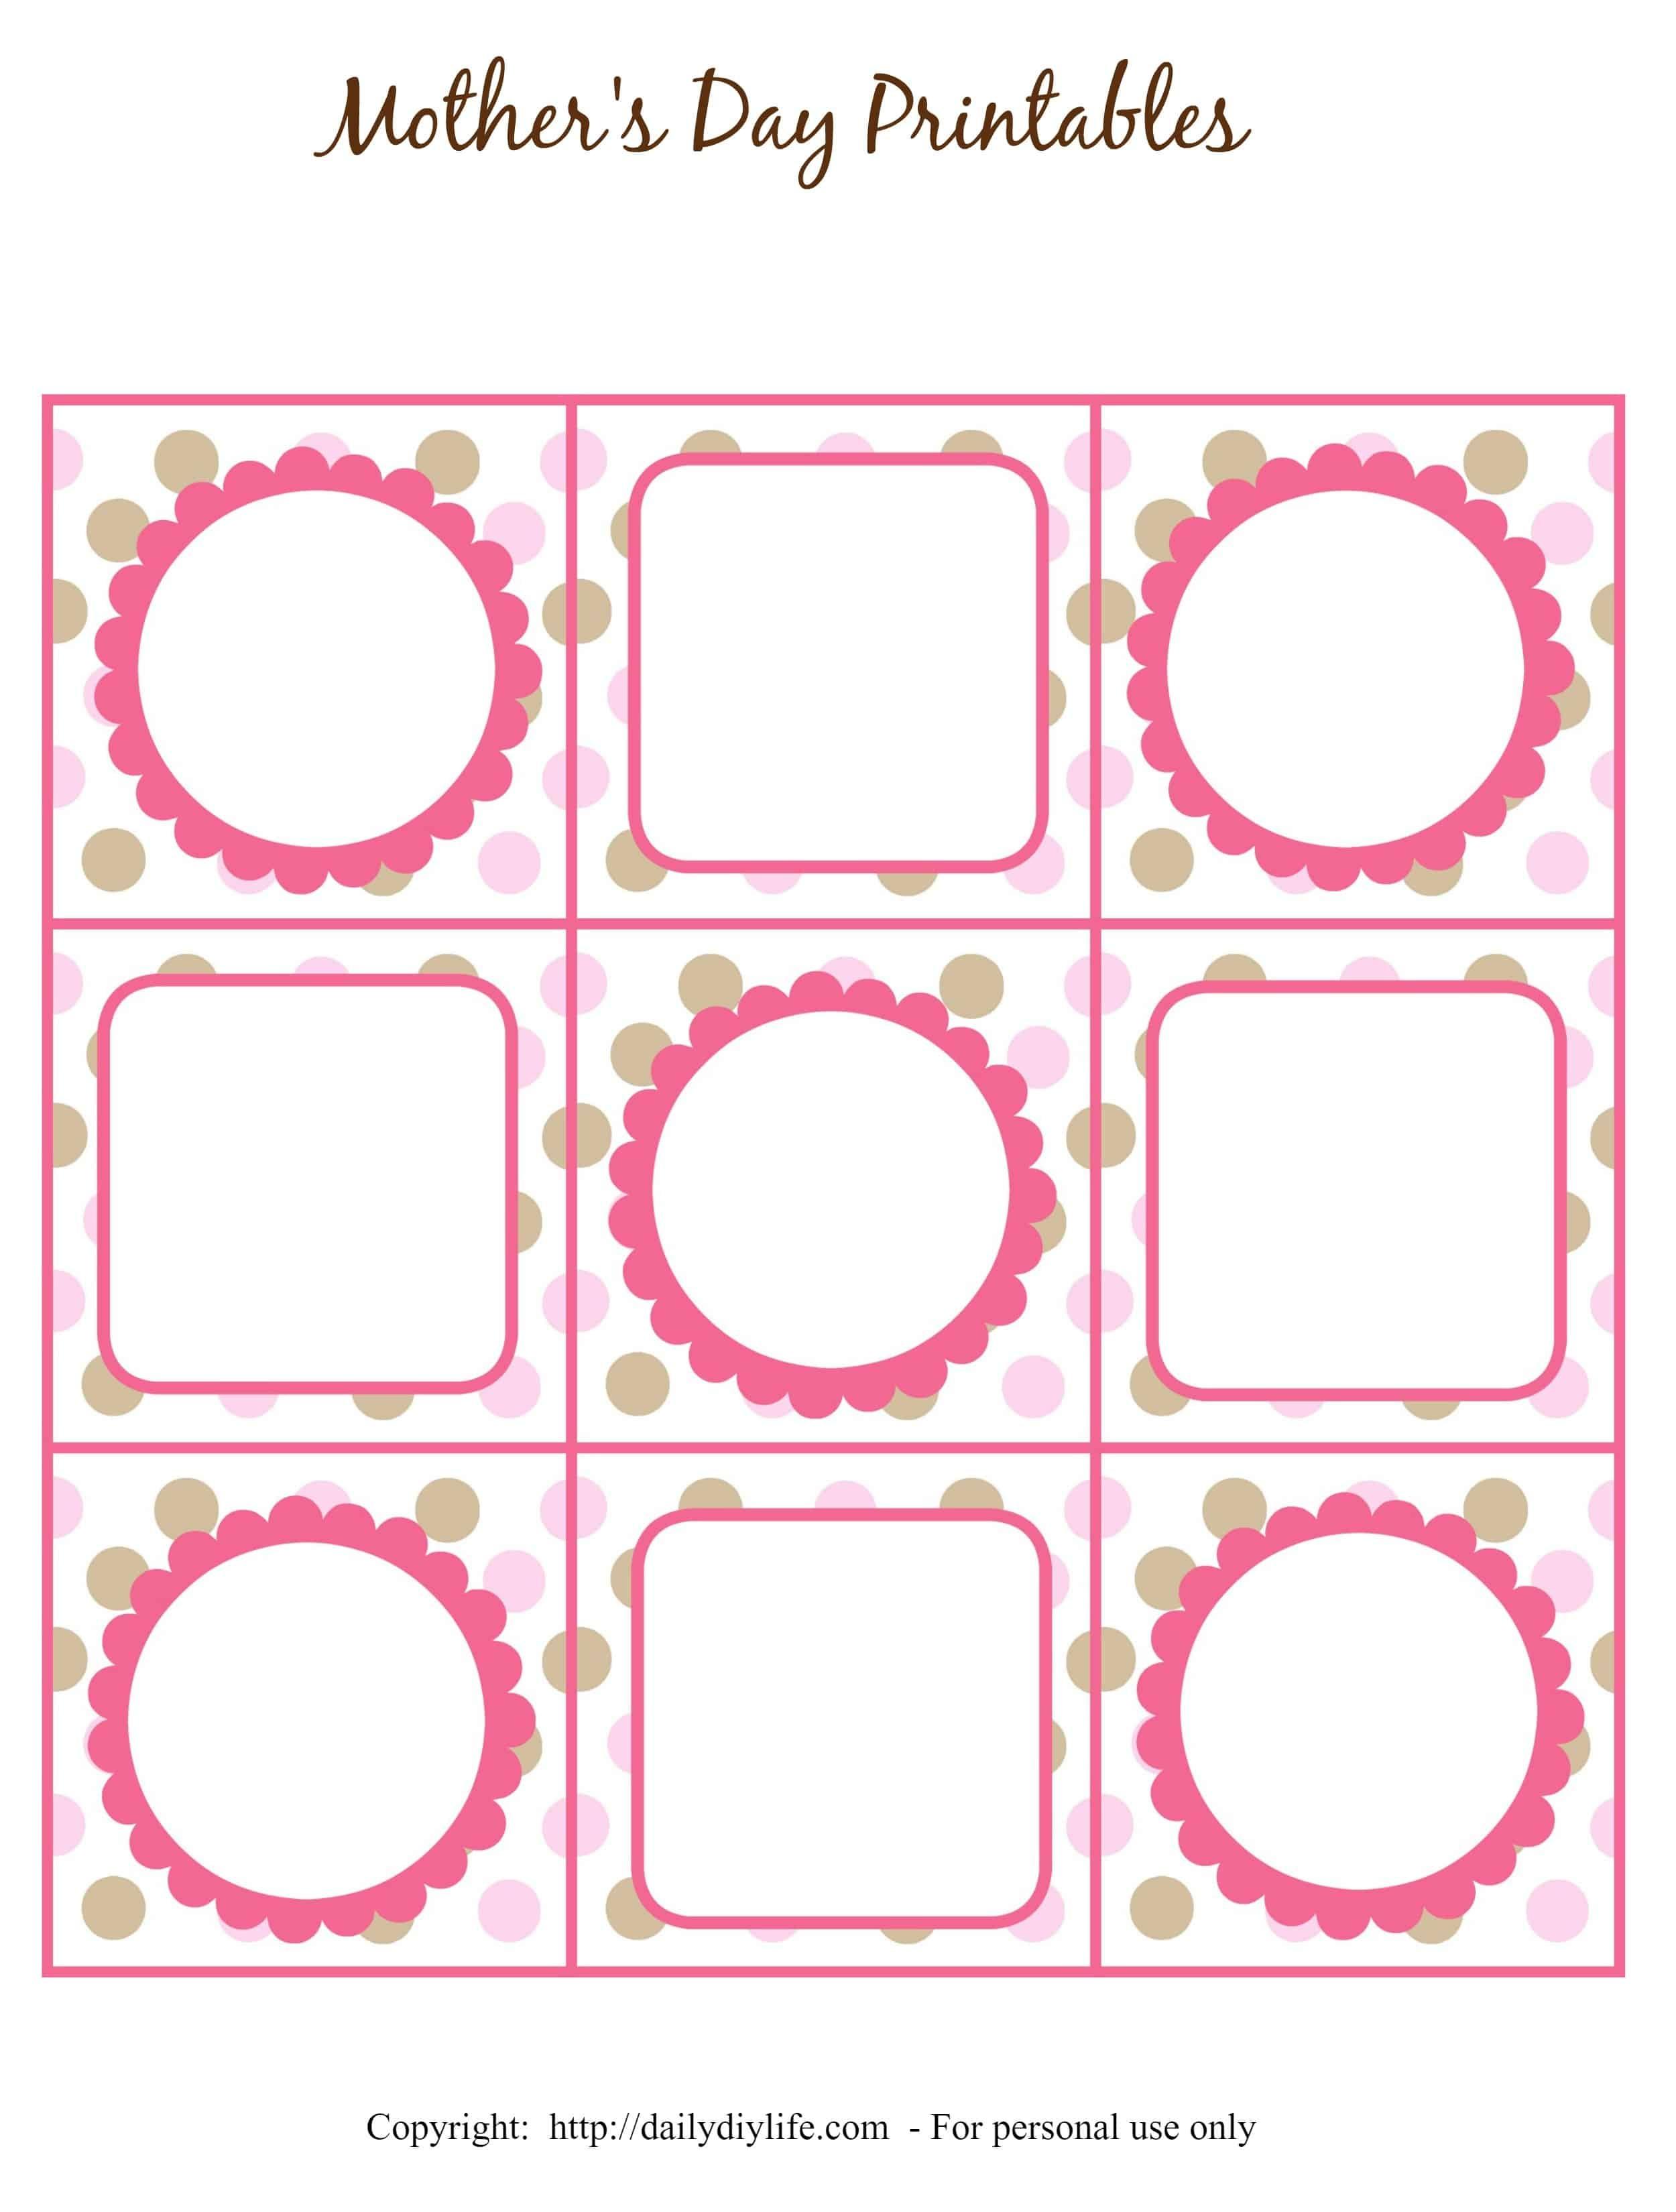 Amazing Free Printable Gift Tag Templates Template Ideas Blank Pdf - Free Printable Blank Gift Tags